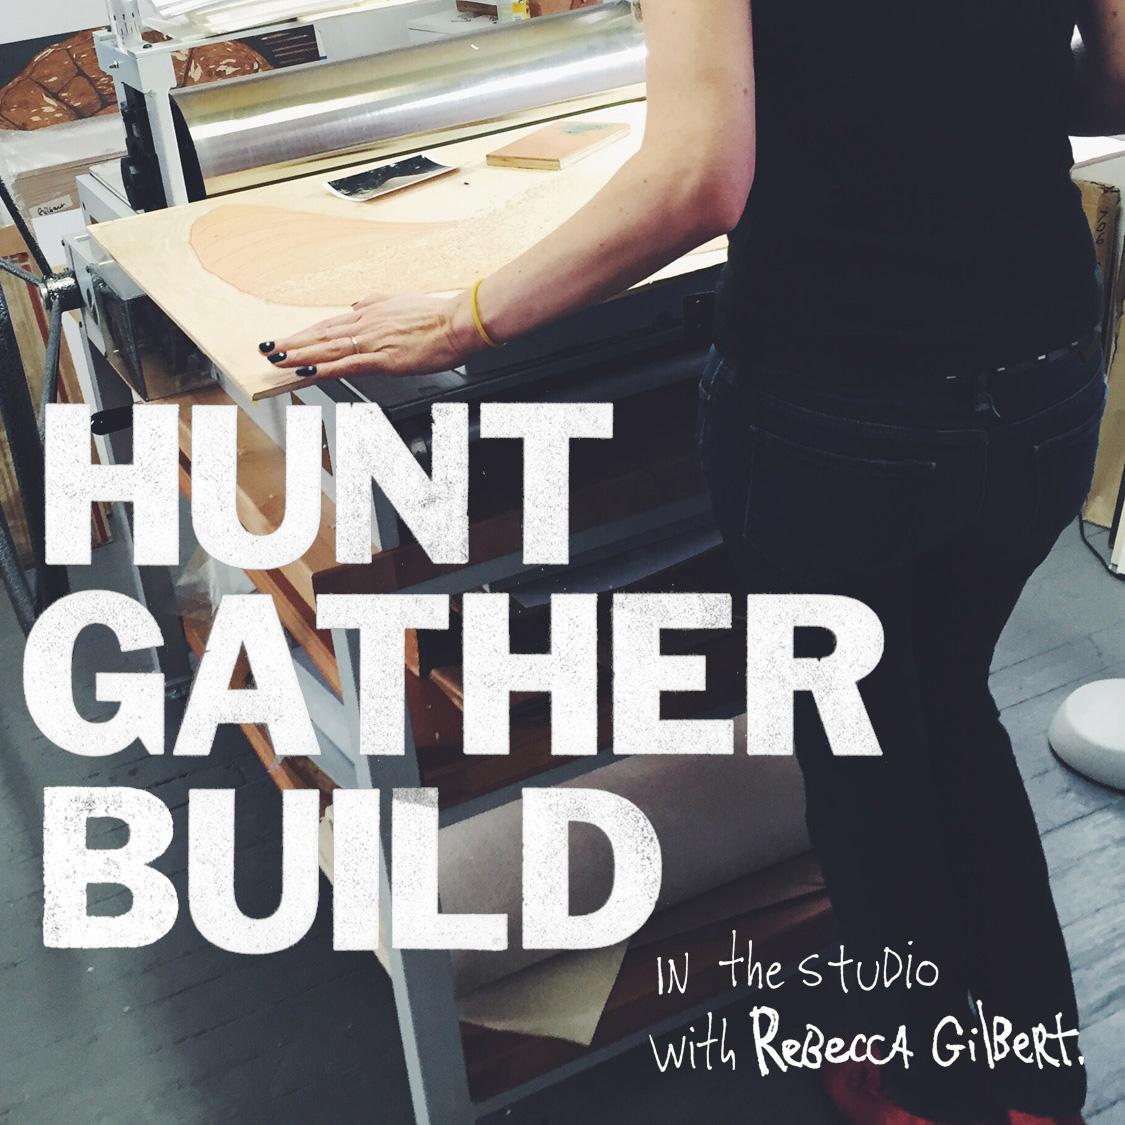 HUNT, GATHER, BUILD